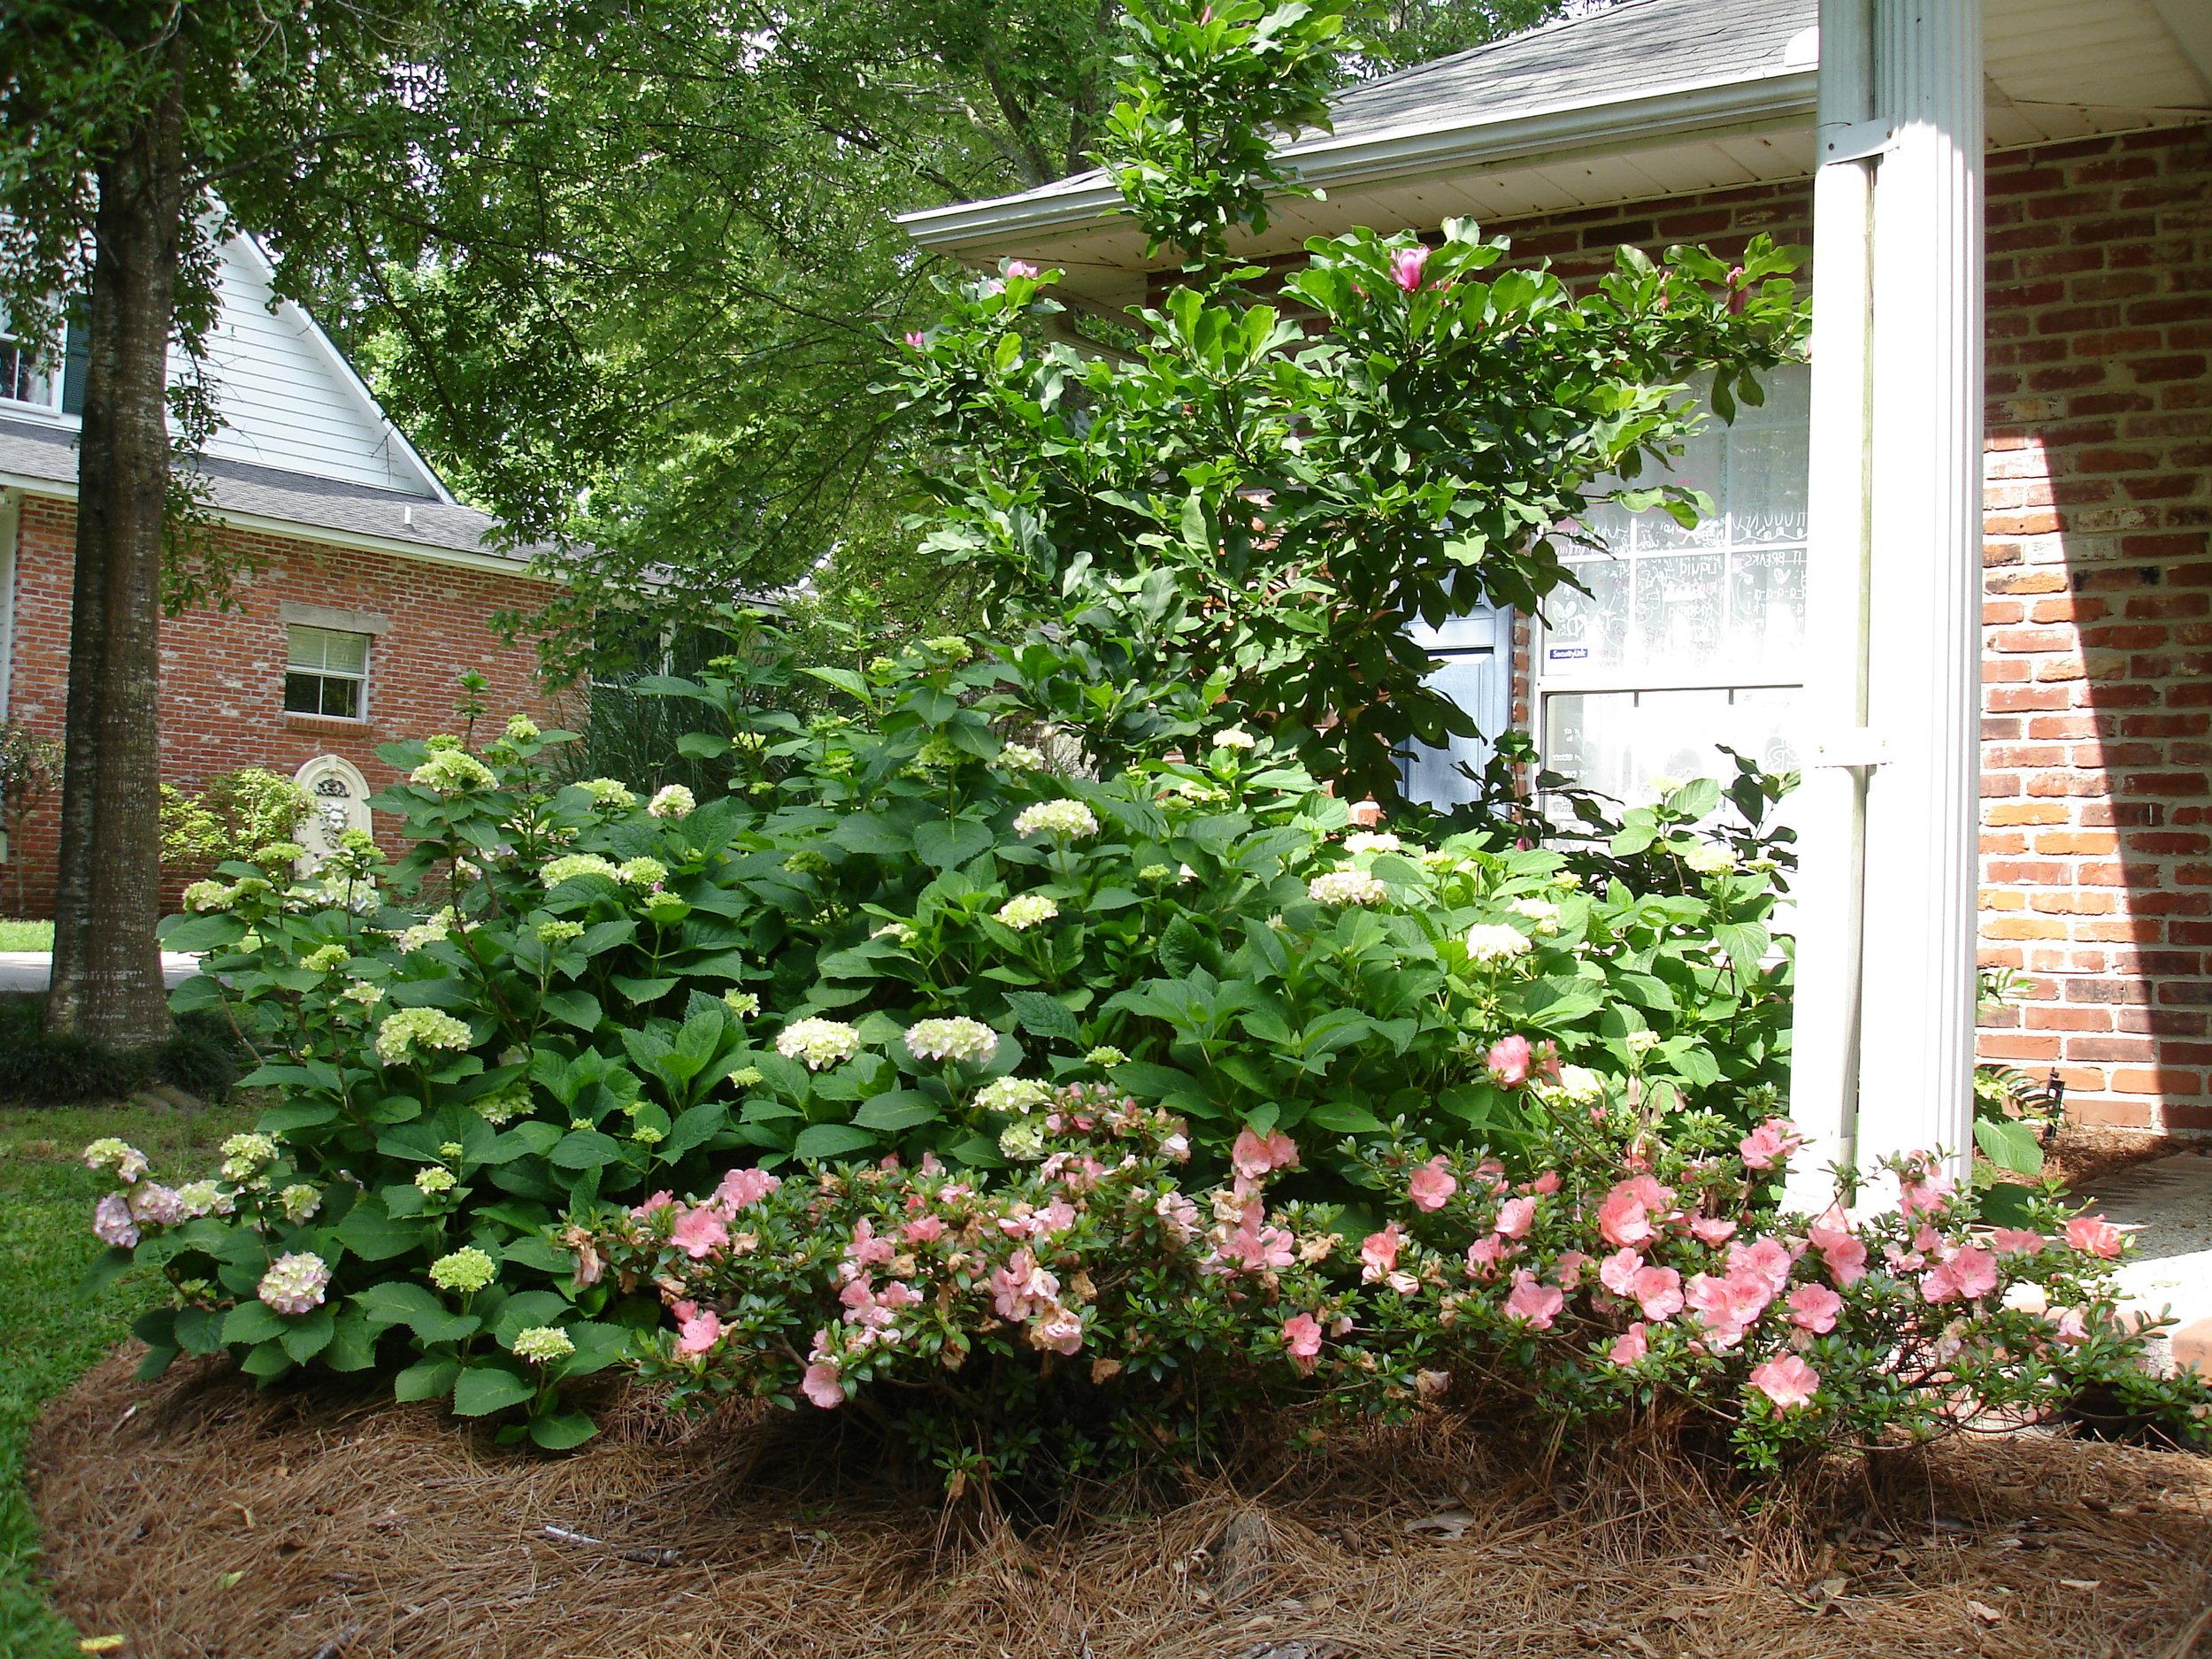 flowerbed-maintenance-seasonal-color-baton-rouge-area (14).JPG